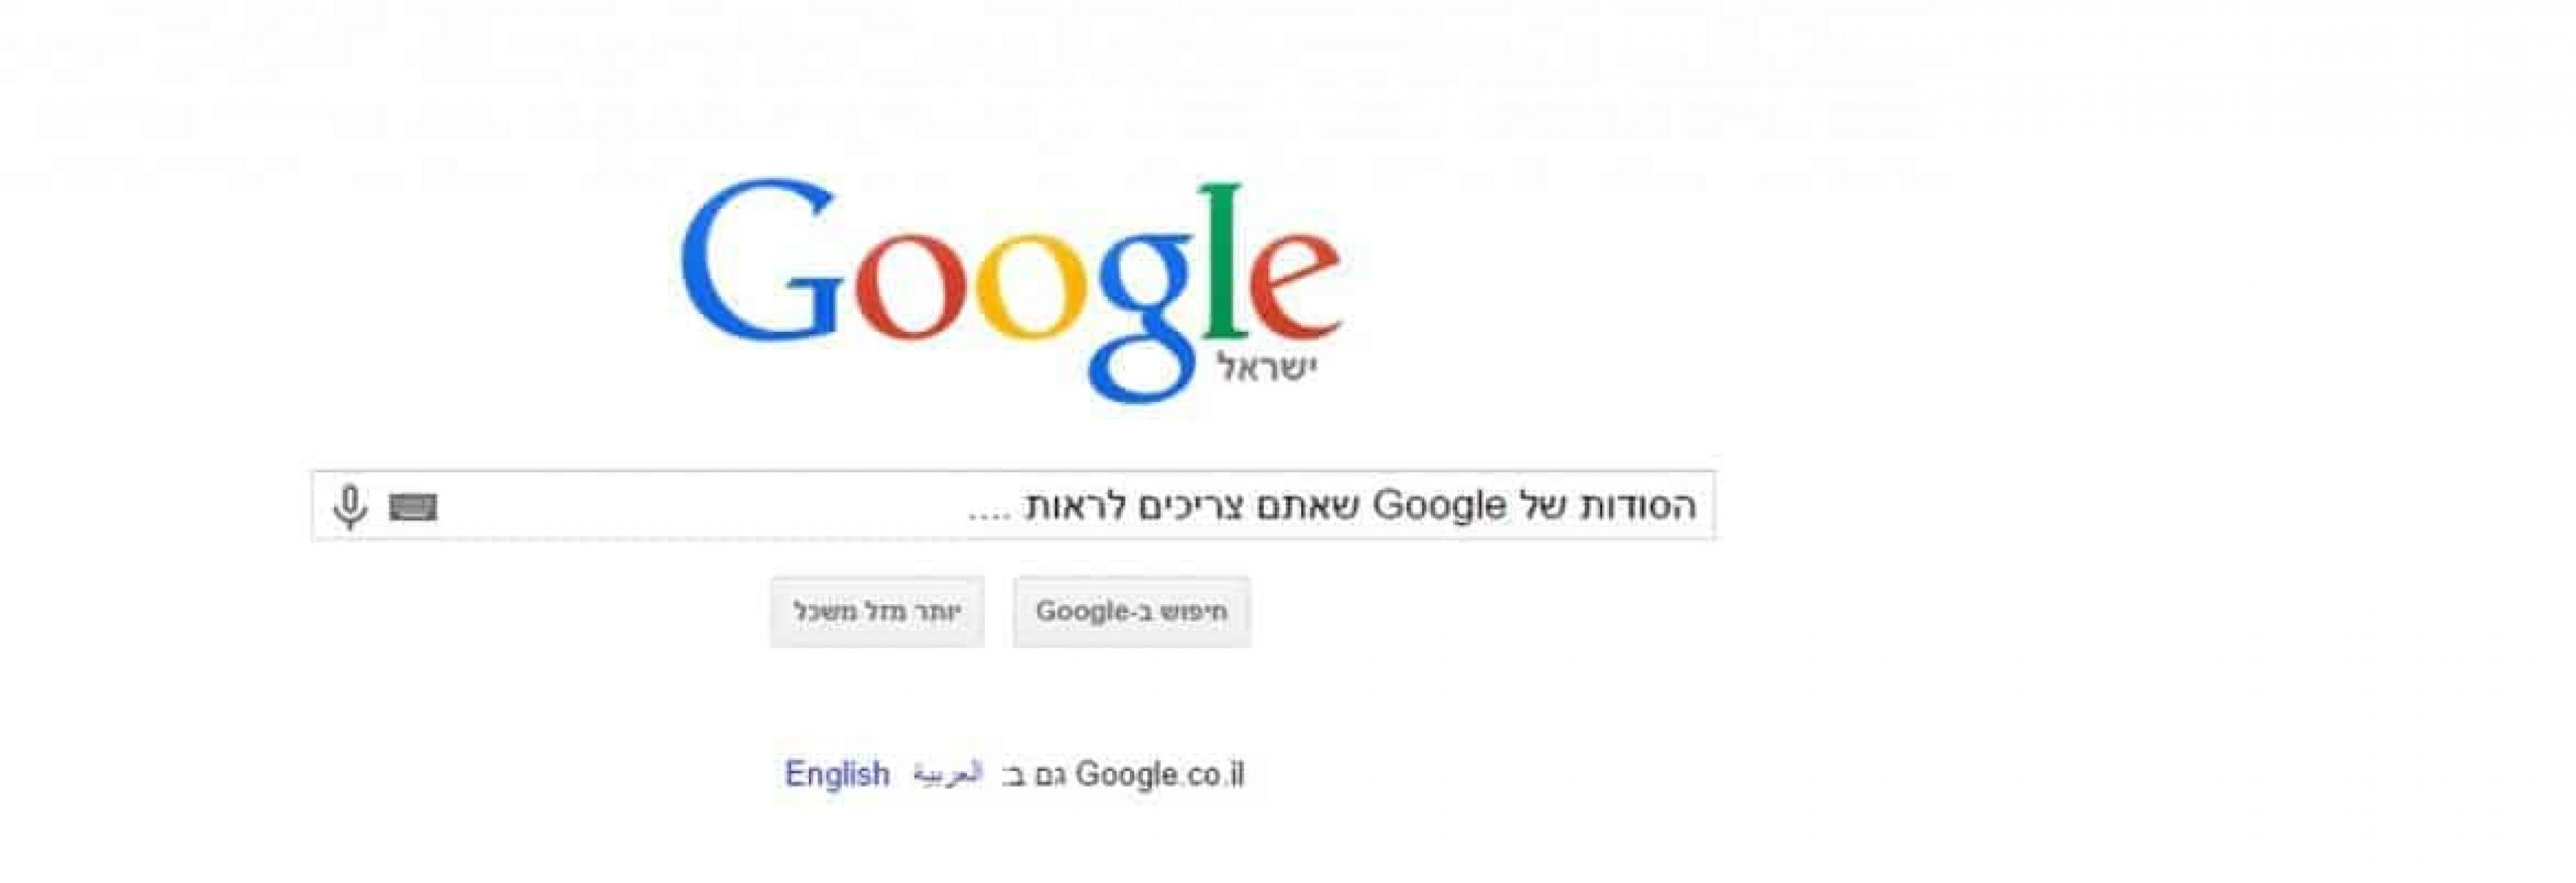 google-e1418062124879